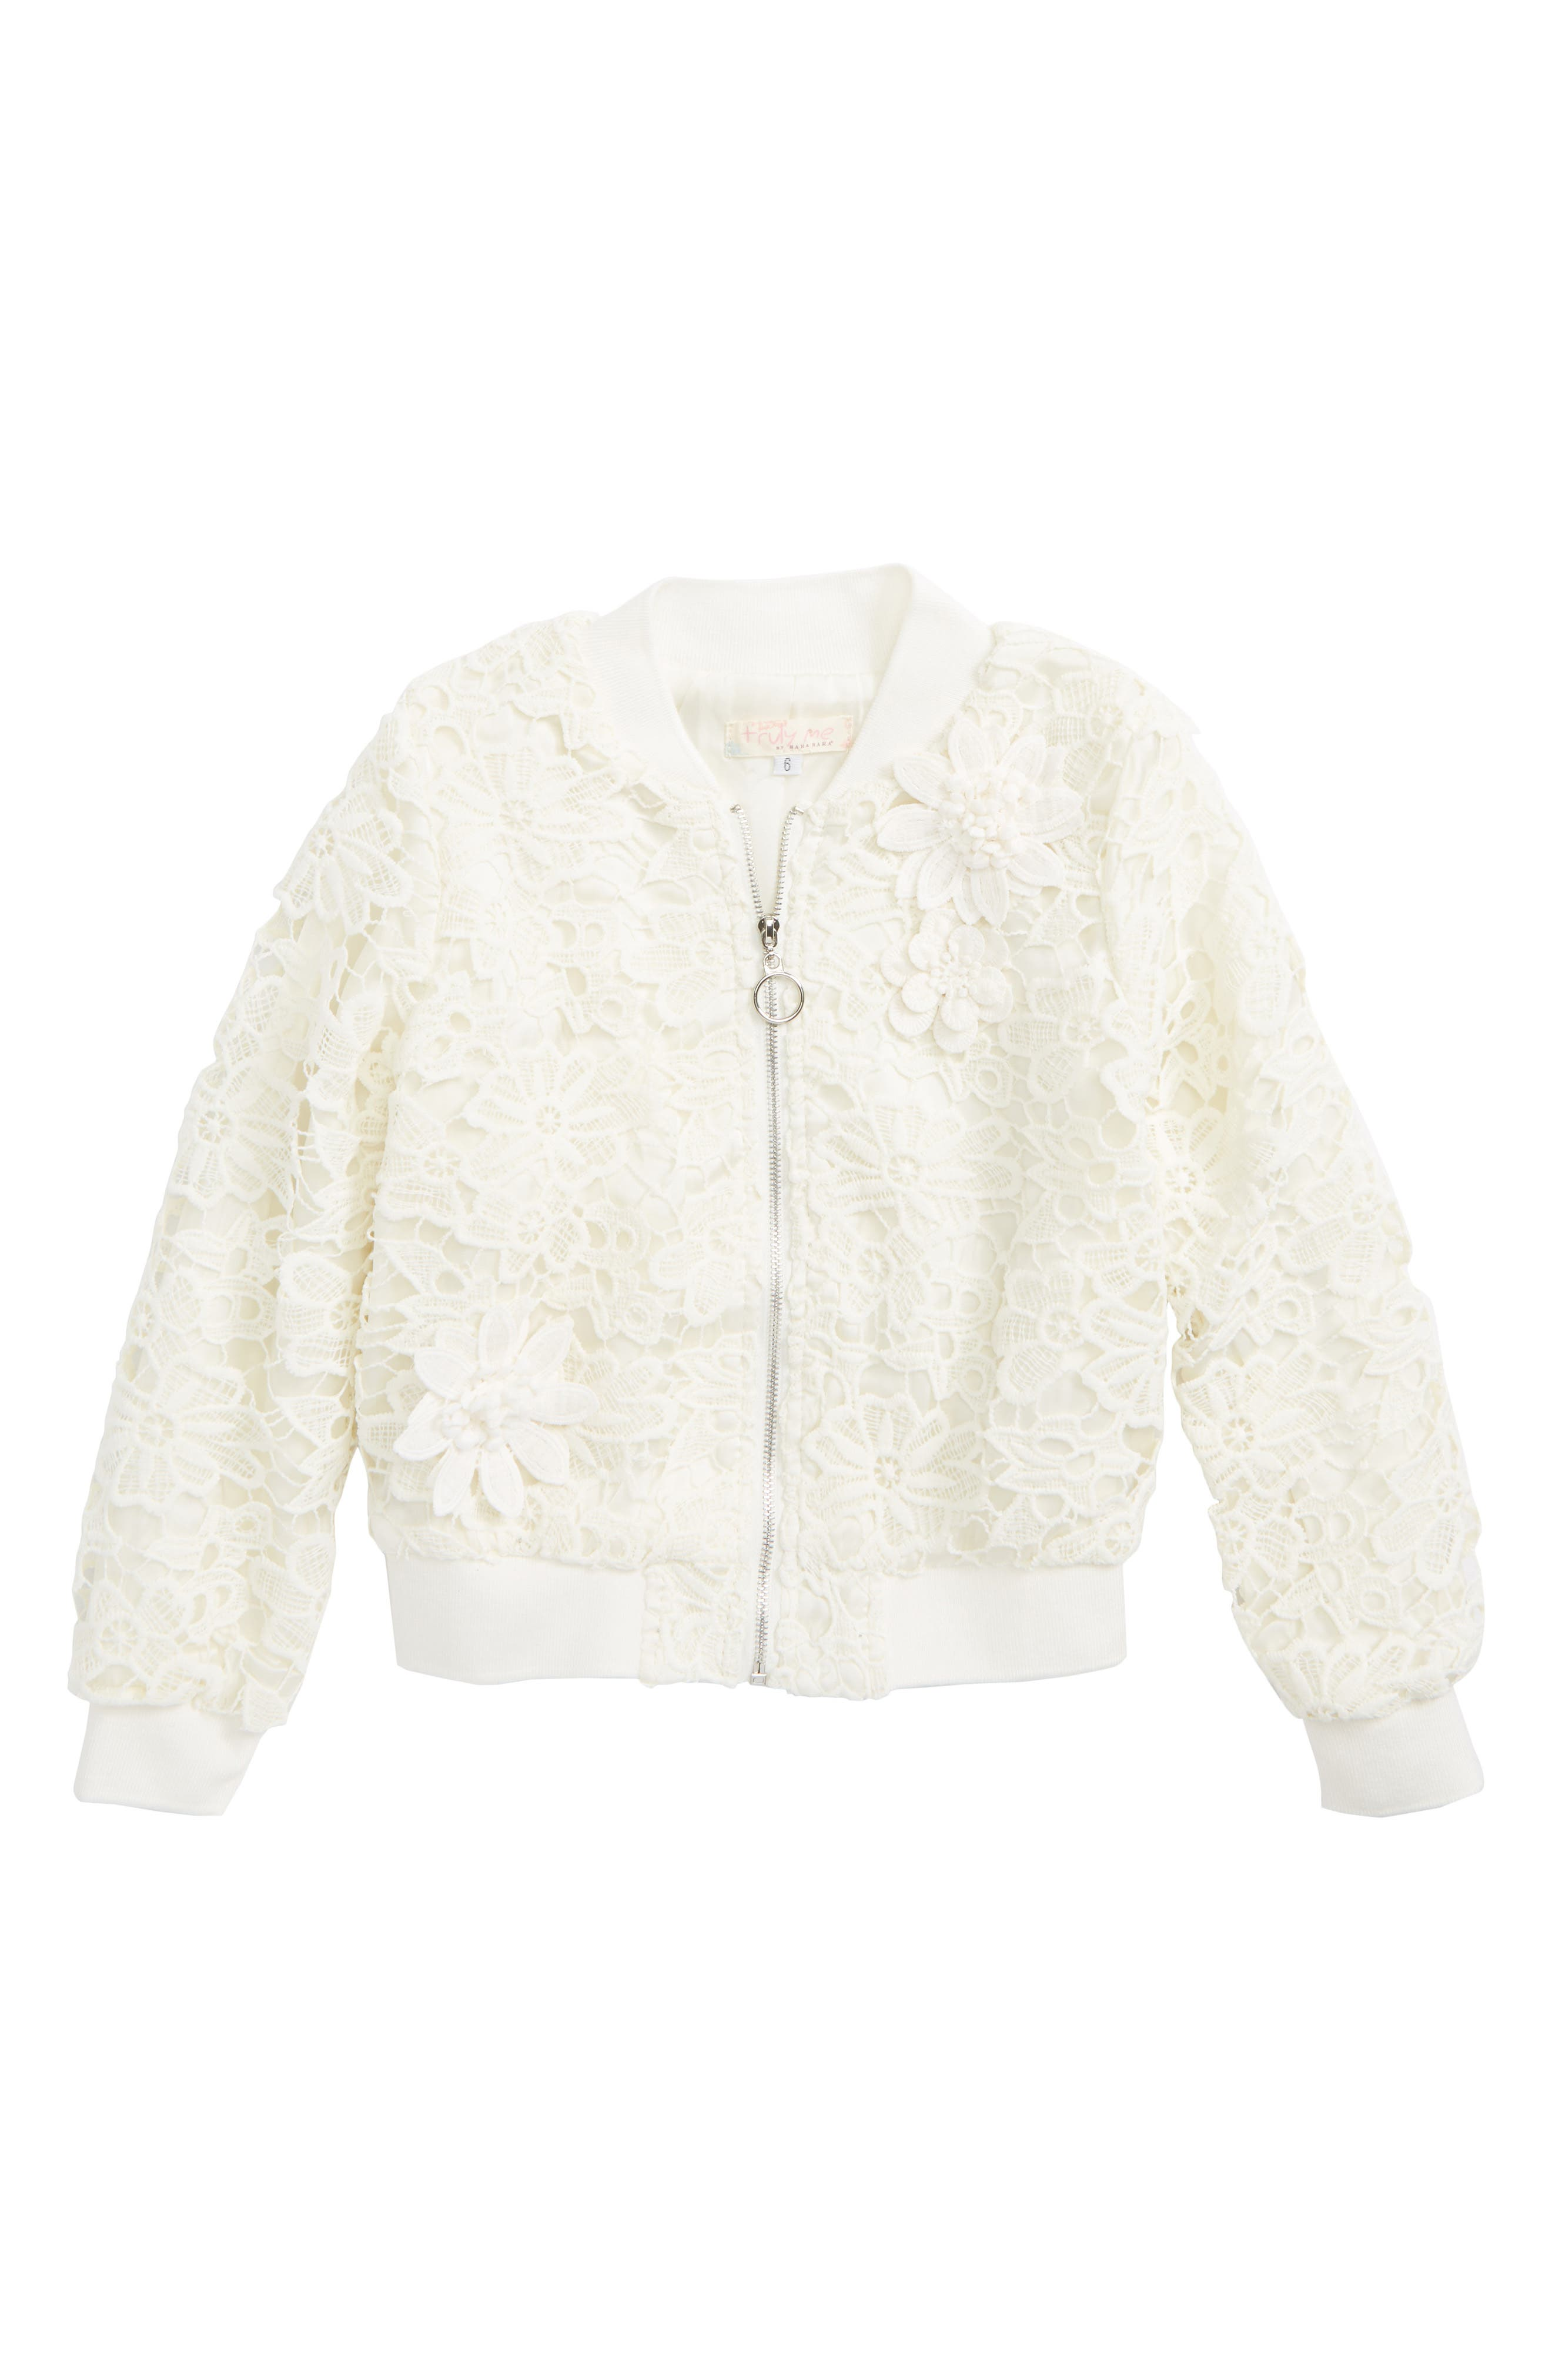 Lace Bomber Jacket,                             Main thumbnail 1, color,                             Cream